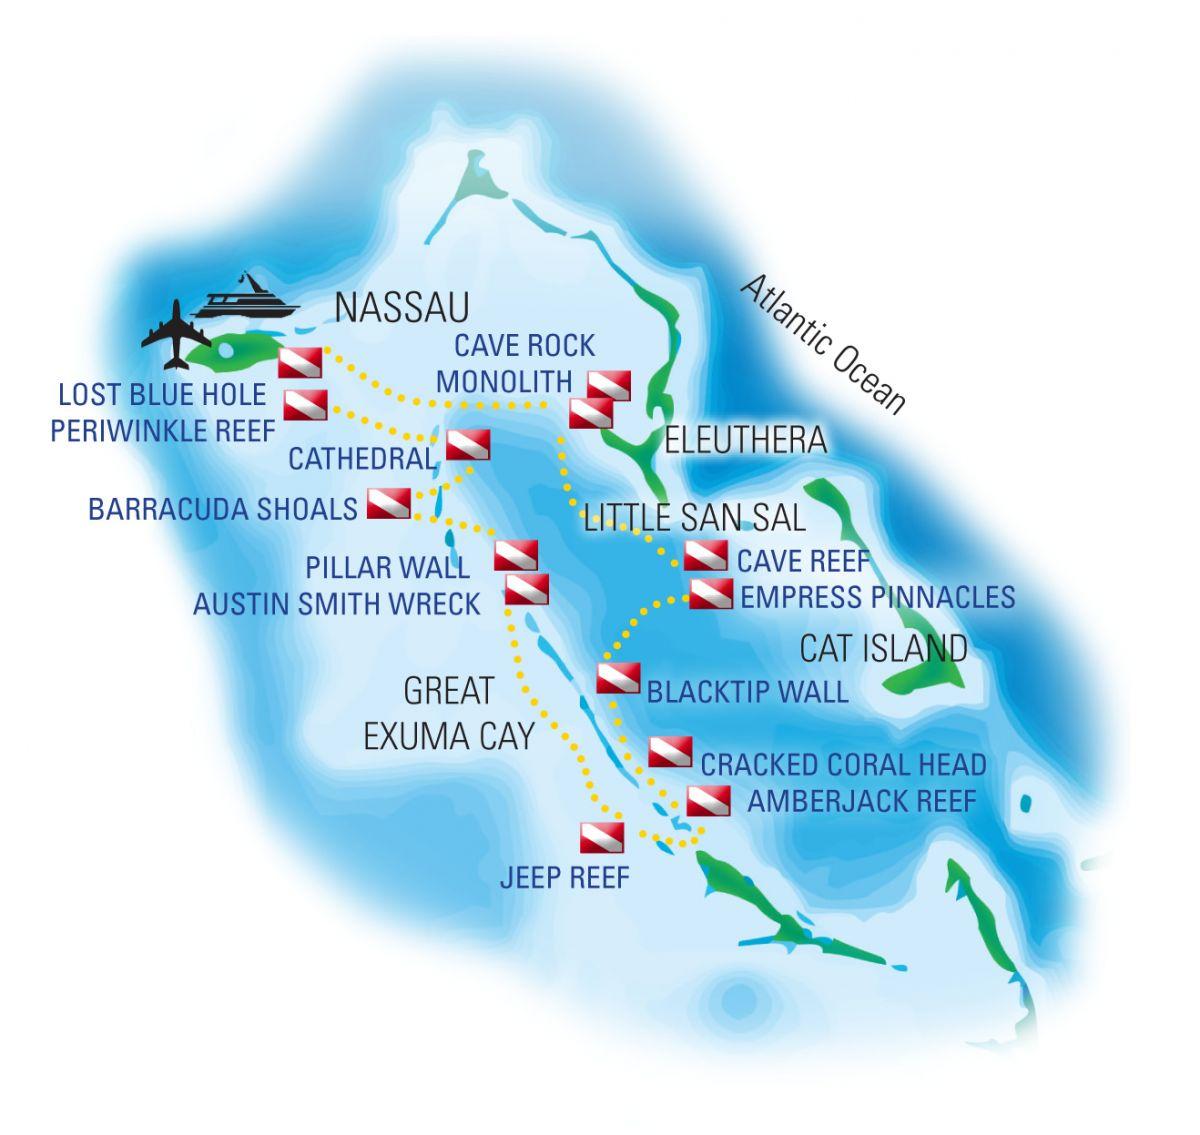 Exuma Cays Regaldive